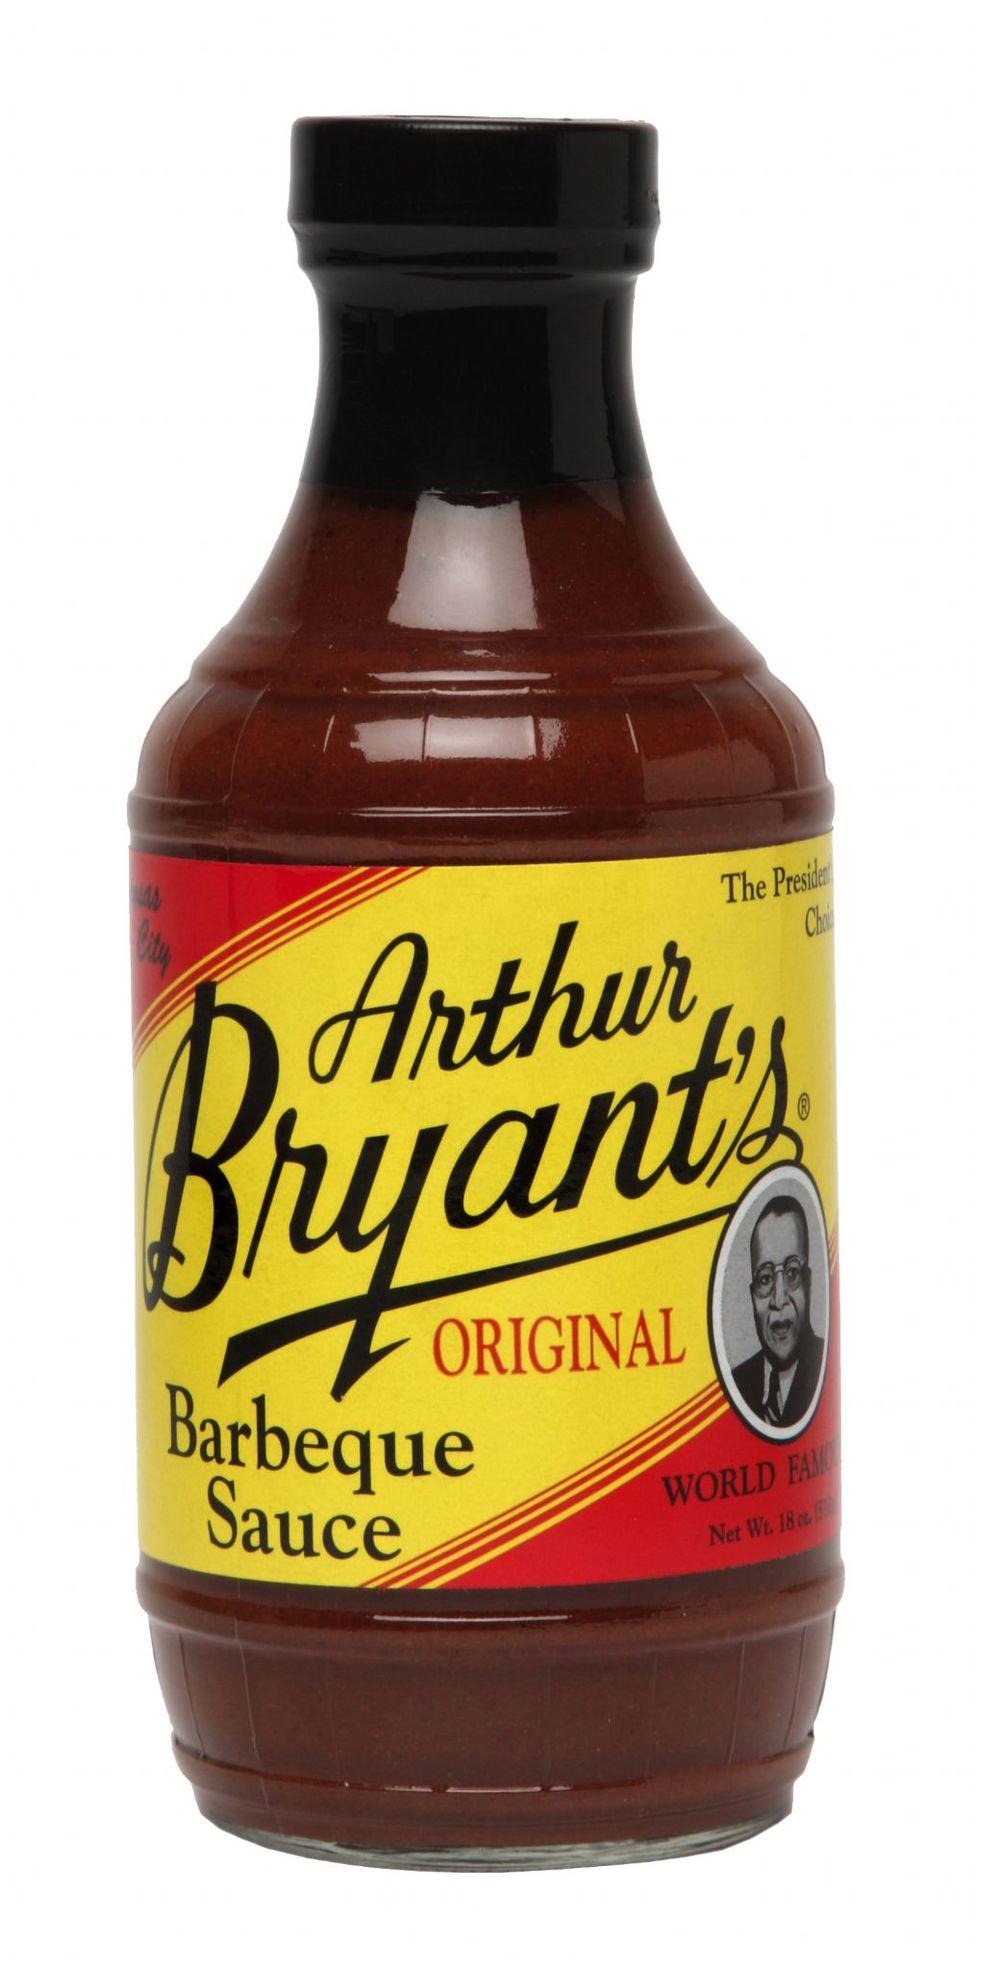 Arthur-Bryant-s-Original-BBQ-Sauce-510g-18-oz--102-p.jpg